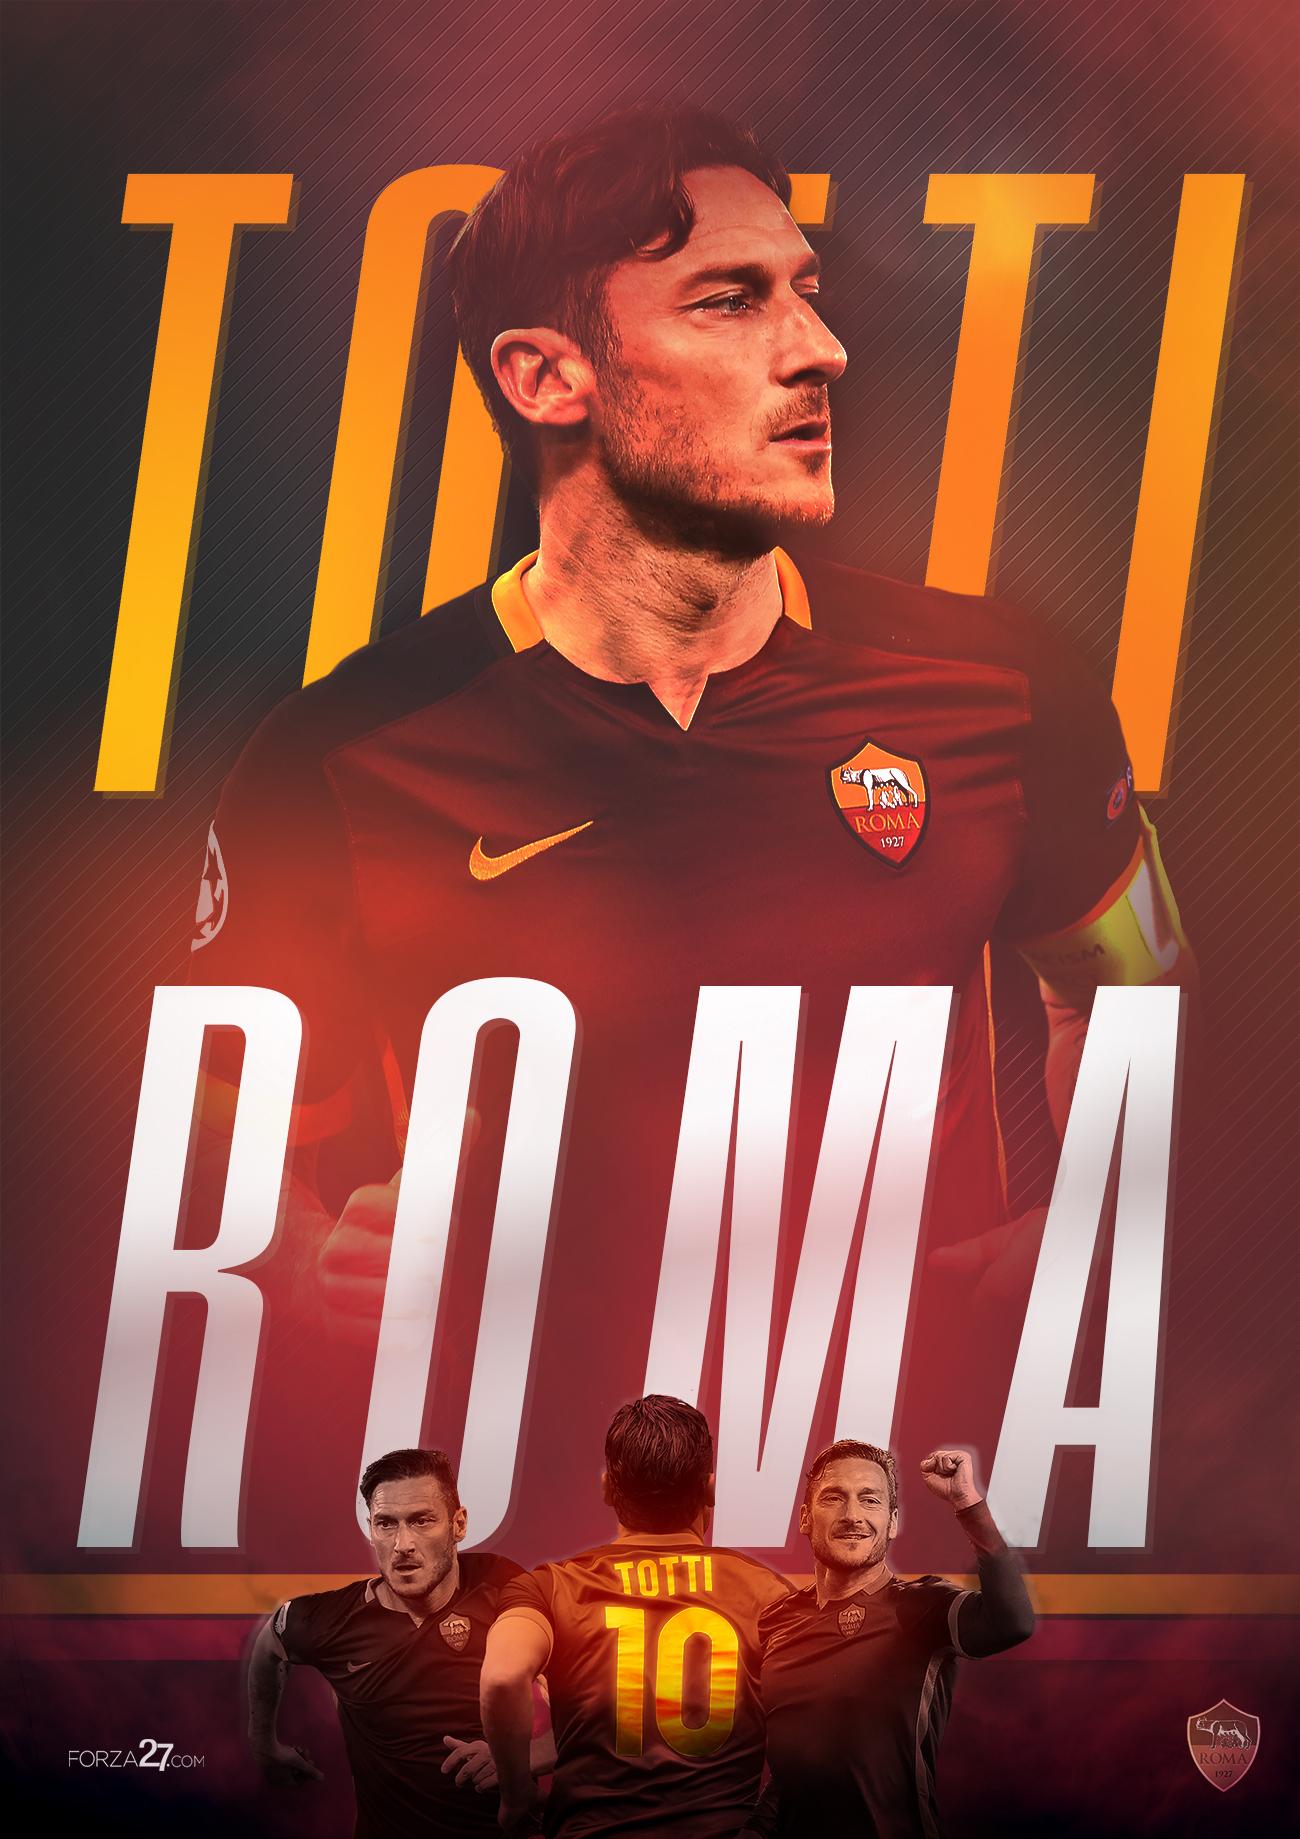 Forza27 » Totti 2017